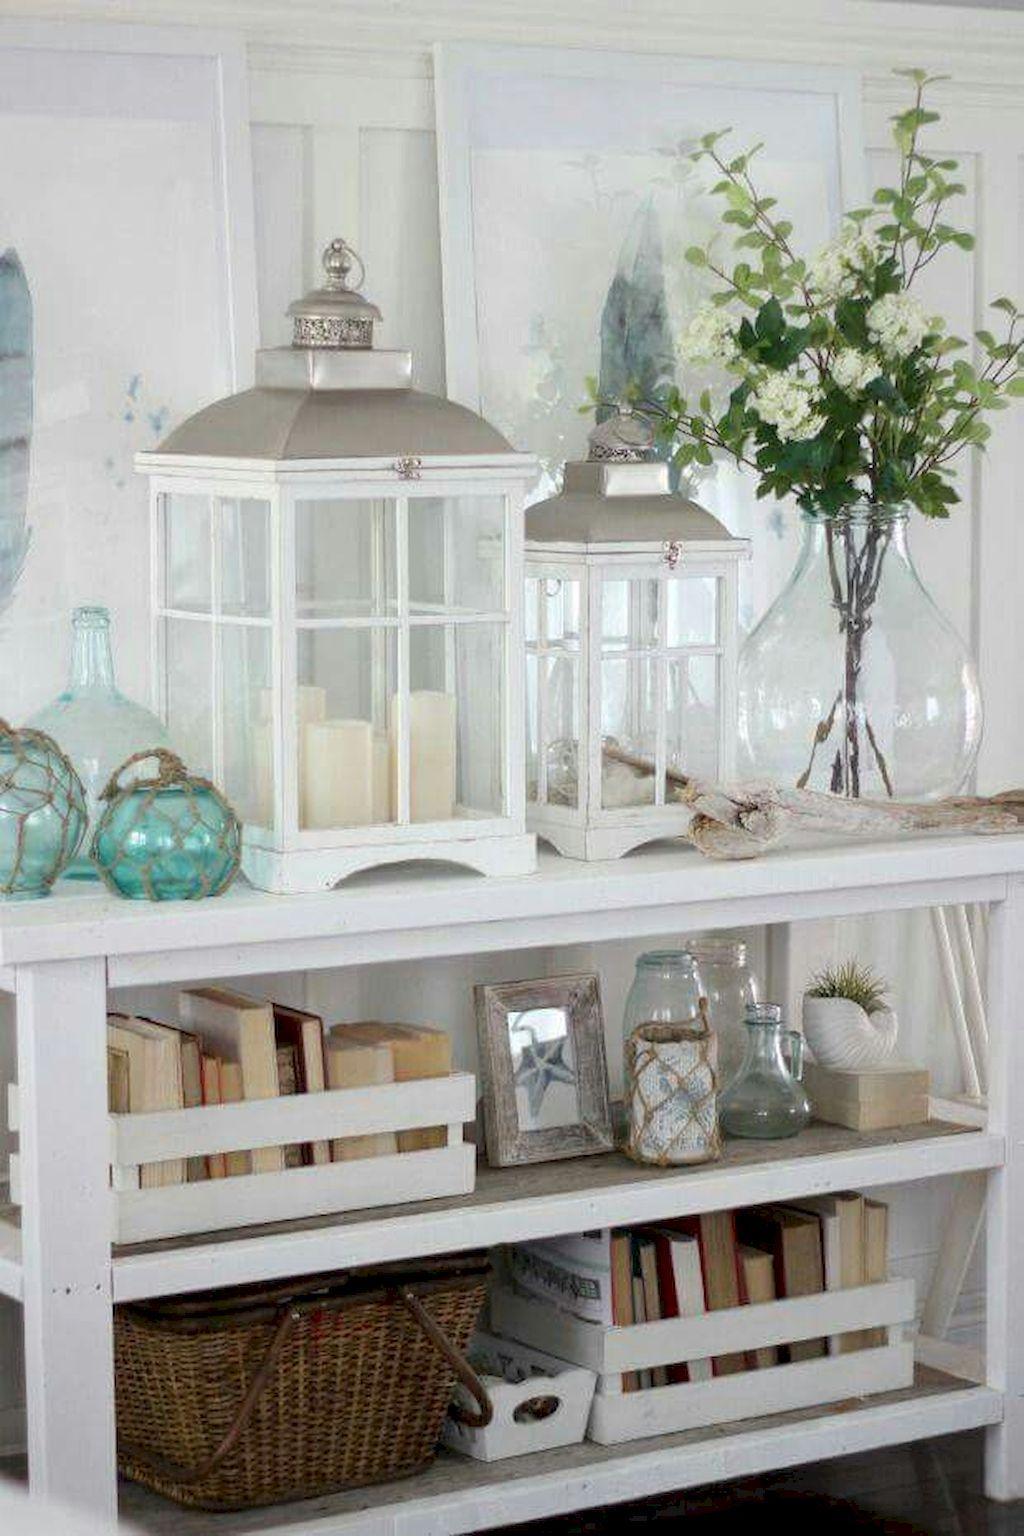 65 Beautiful Coastal Themed Living Room Decorating Ideas | Pinterest ...